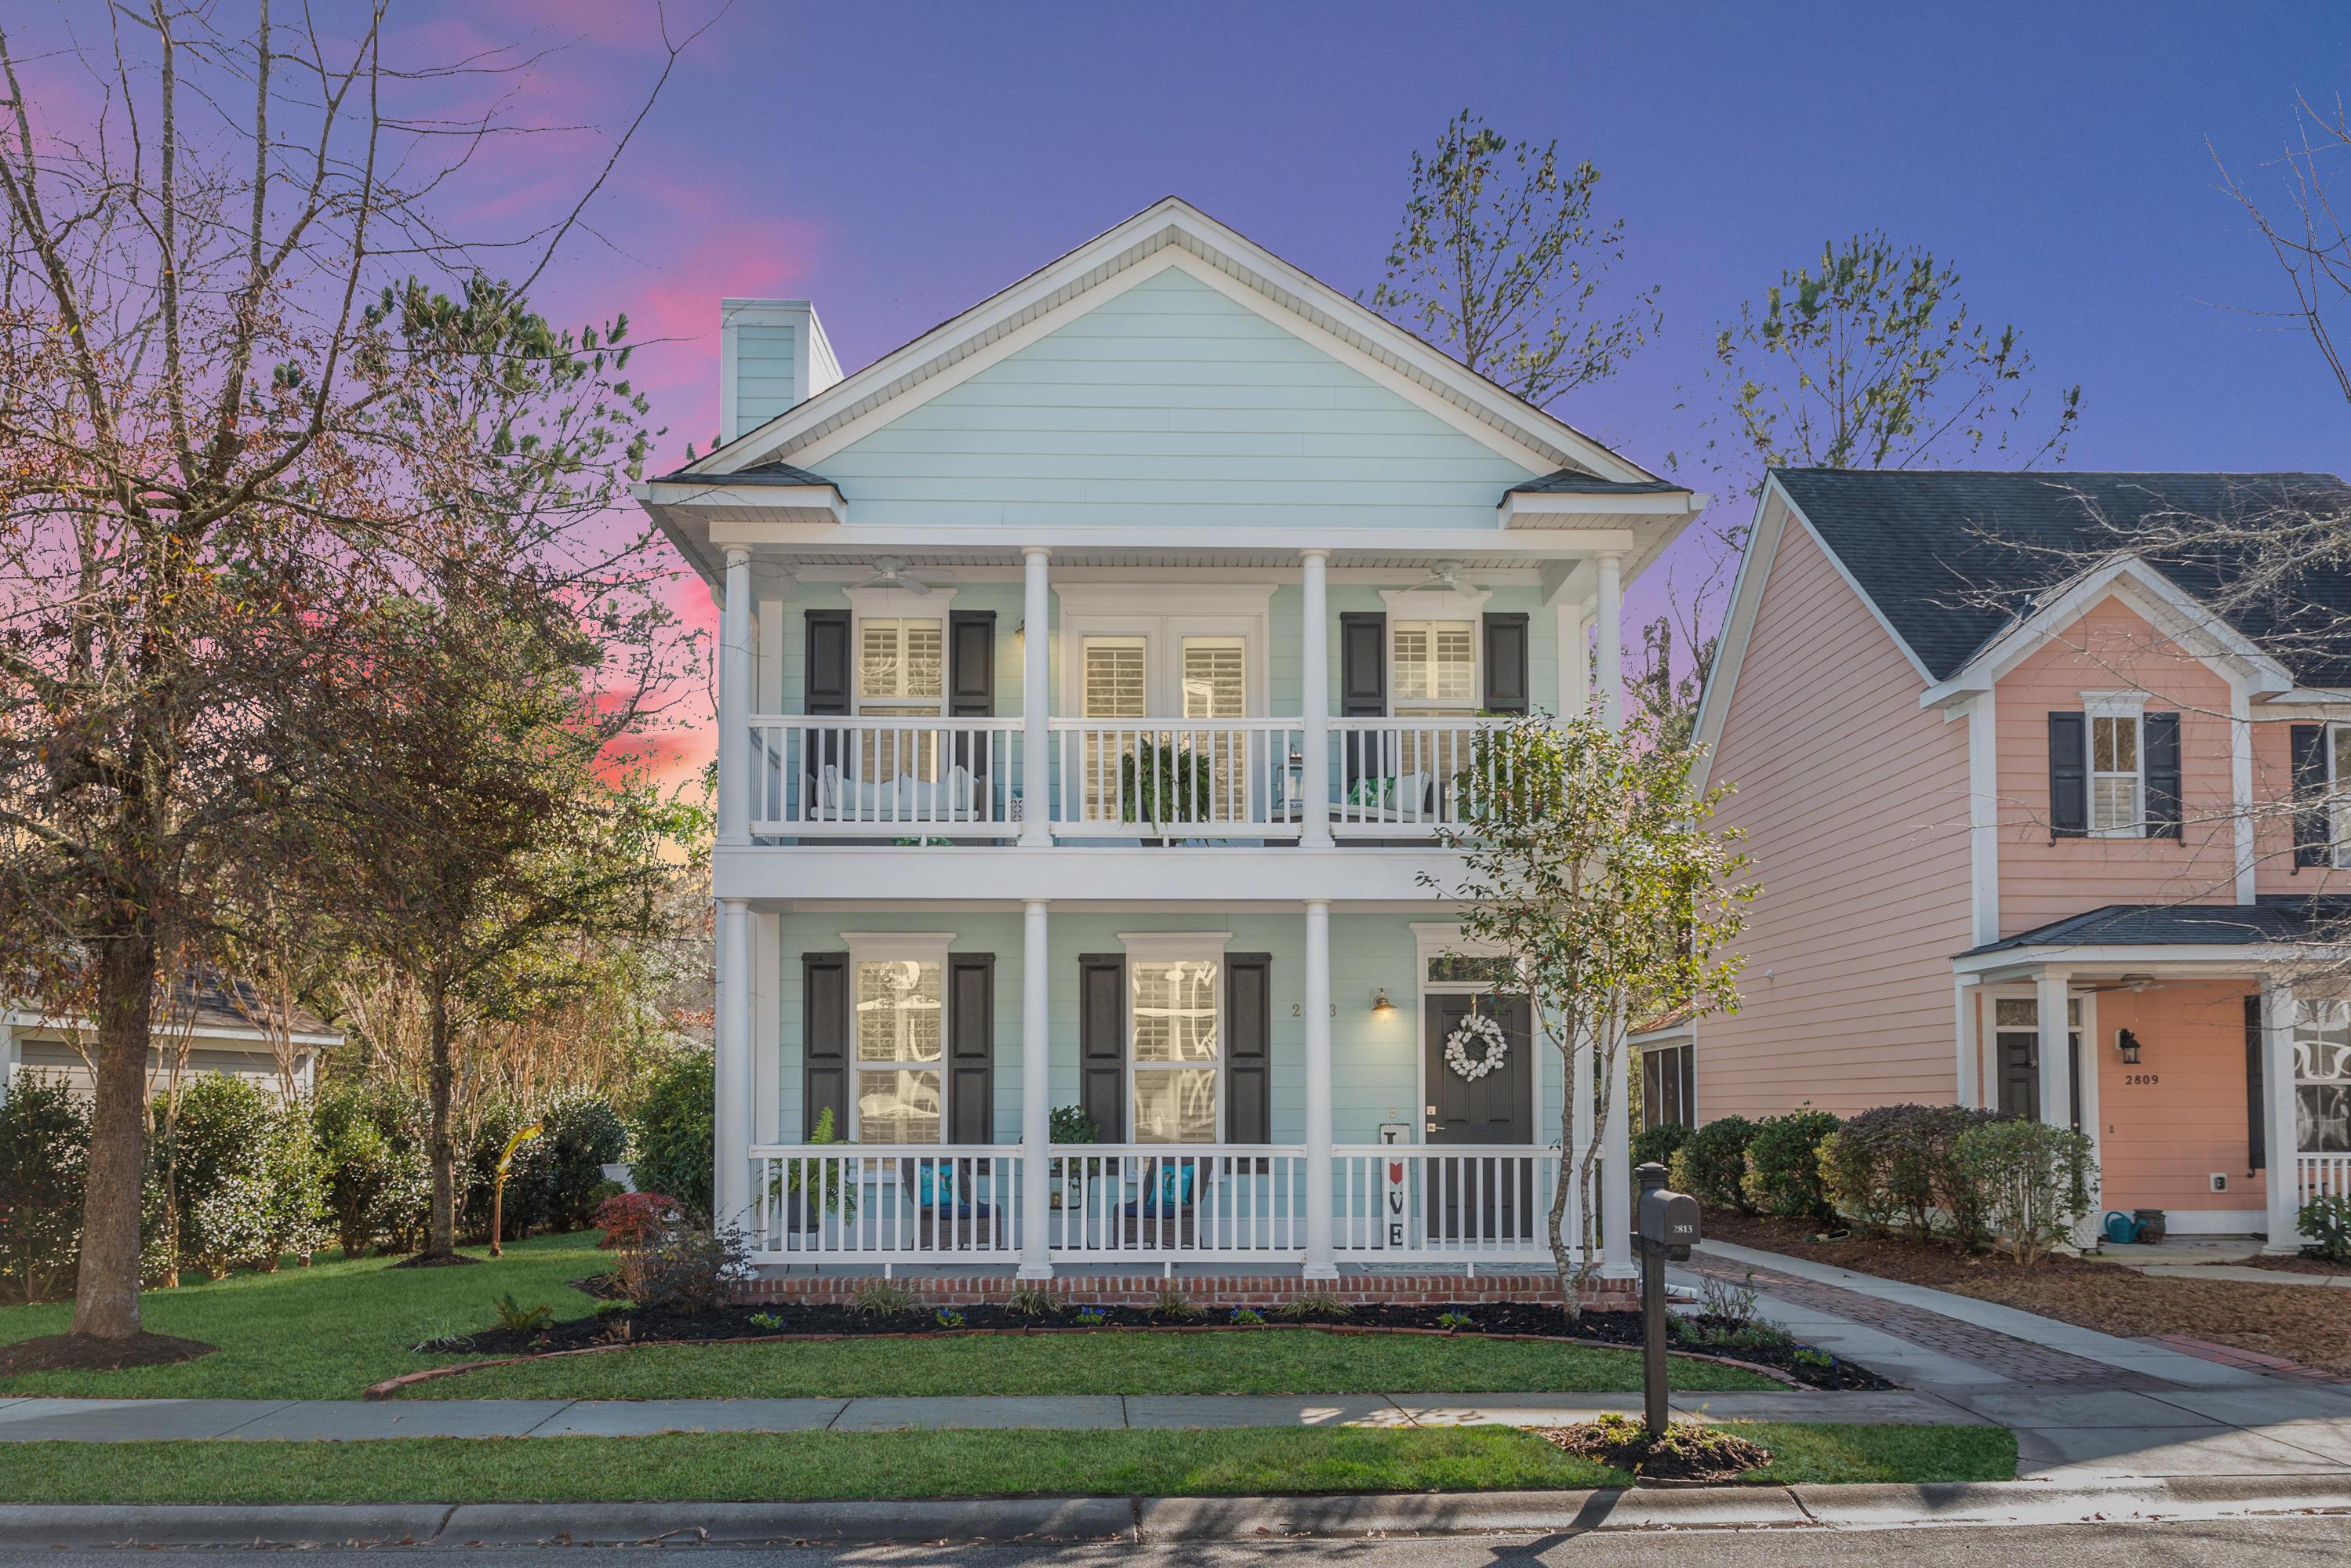 Carol Oaks Homes For Sale - 2813 Caitlins, Mount Pleasant, SC - 21